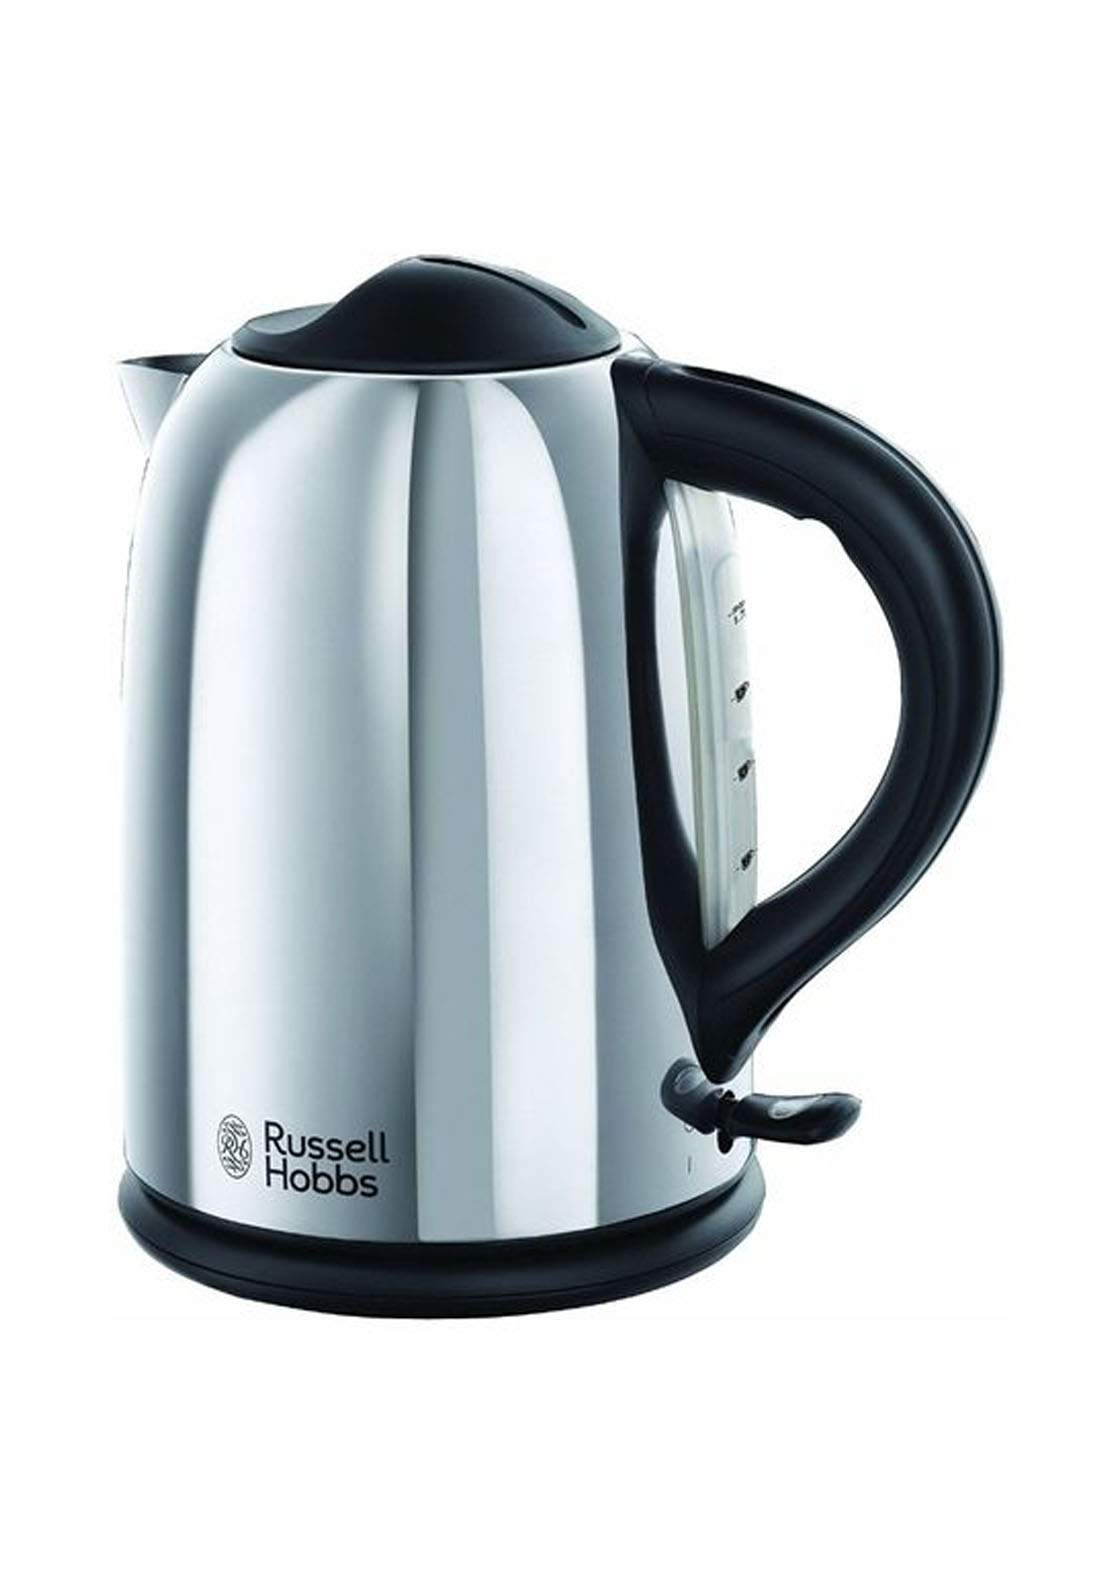 Russell hobbs 20420 Electrical kettle  غلاية